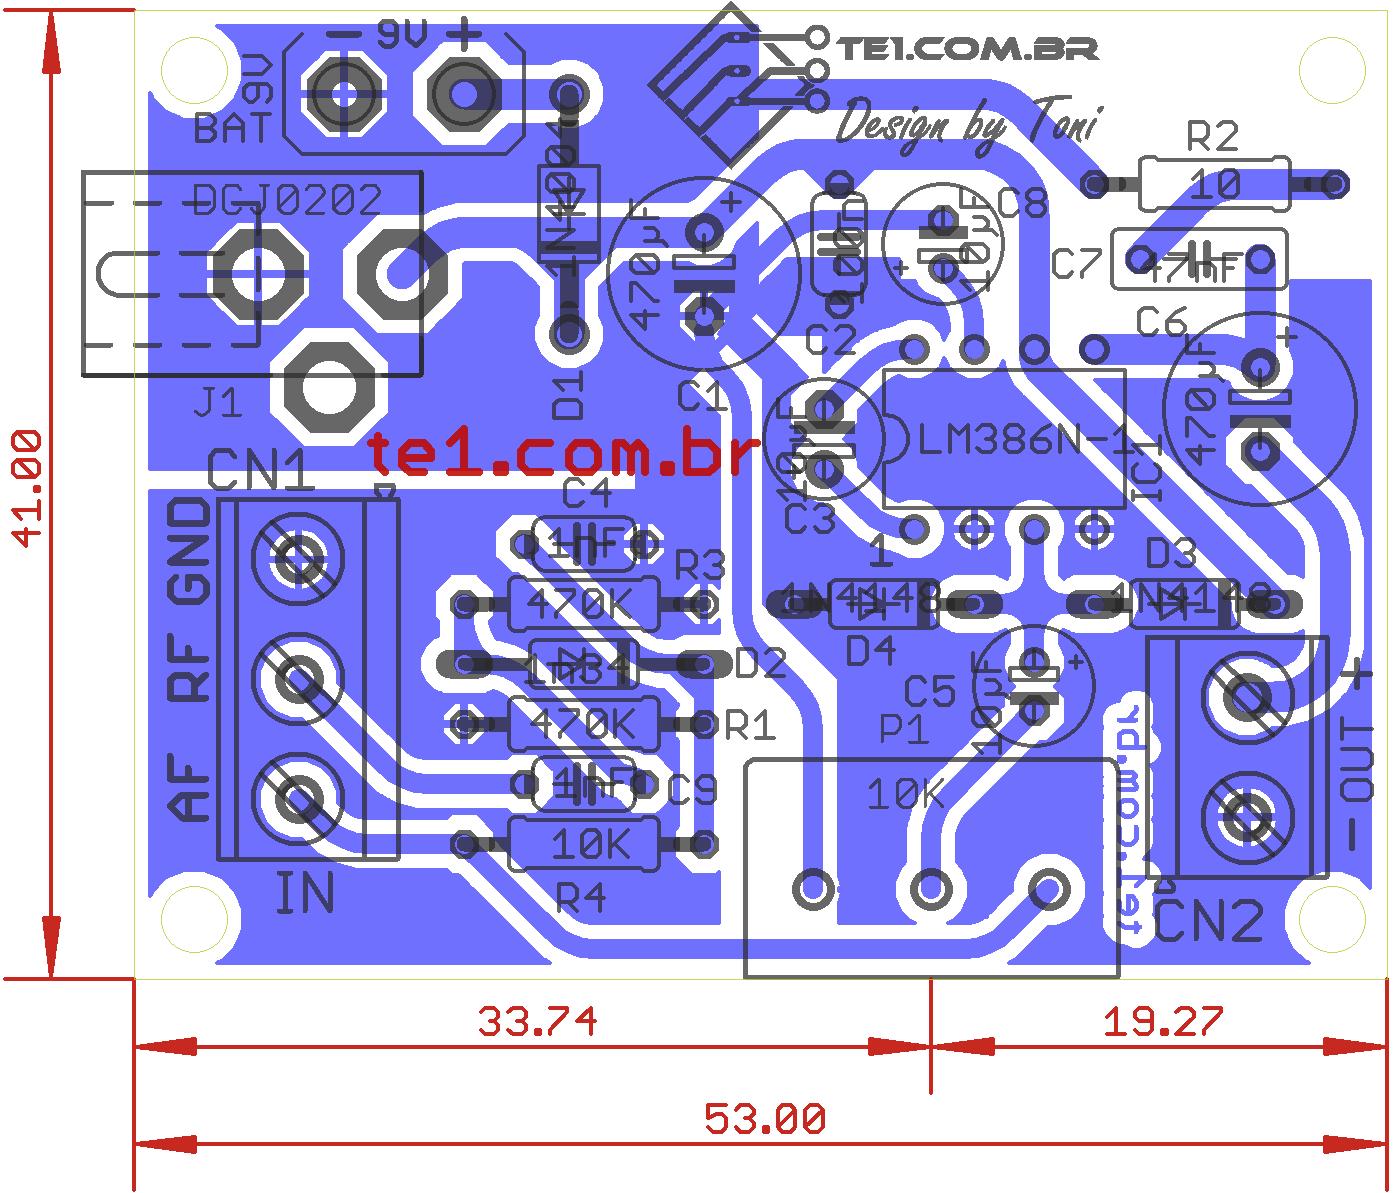 seguidor de sinal Pesquisador de audio lm386 Circuito de seguidor de sinal Pesquisador  de áudio com LM386 Pré amplificadores dicas de conserto Dicas Circuitos Áudio